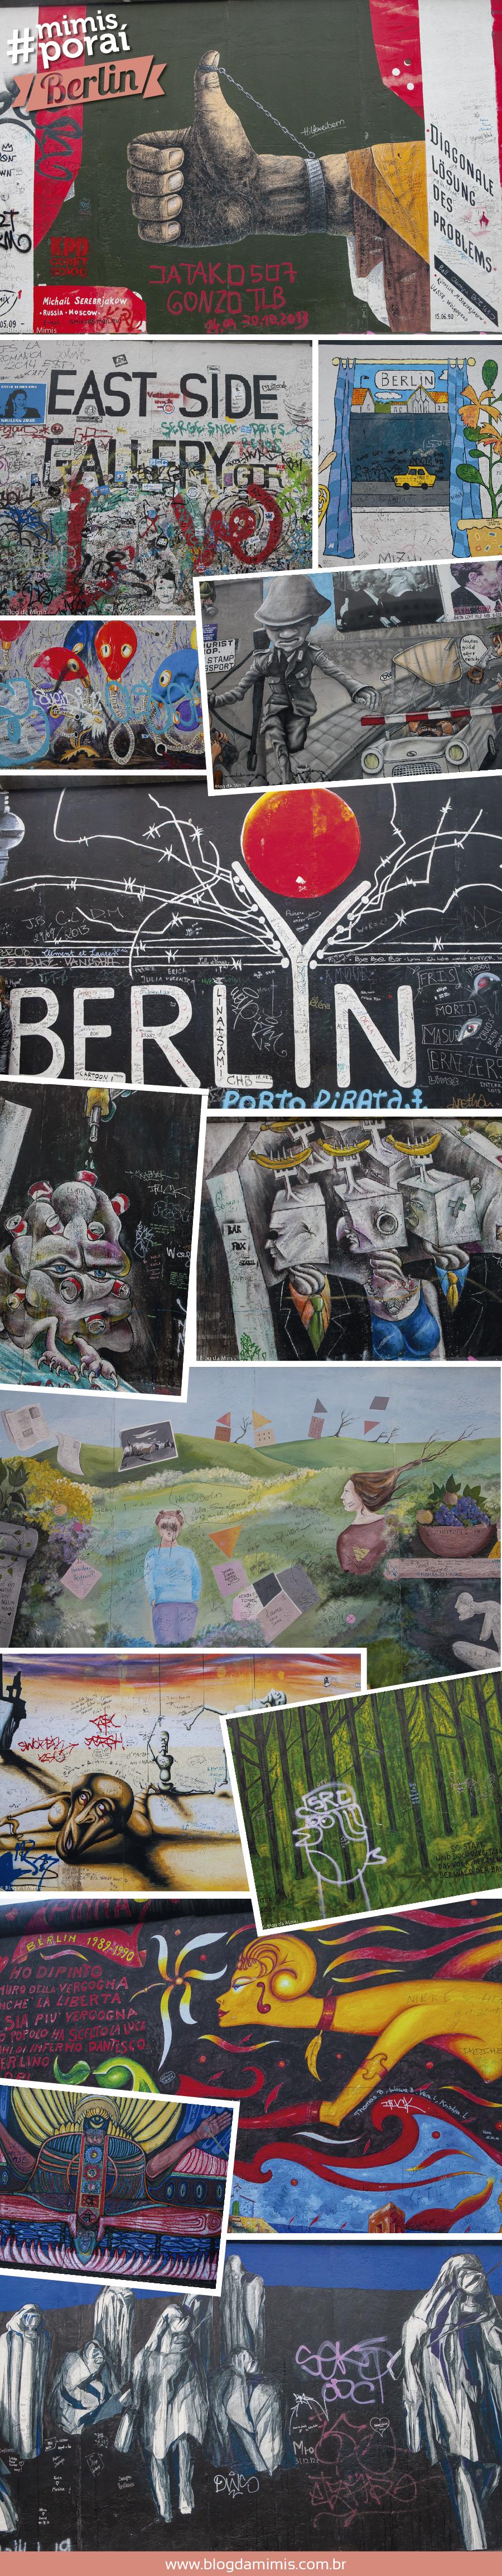 east-side-berlin-blog-da-mimis-michelle-franzoni-01-01